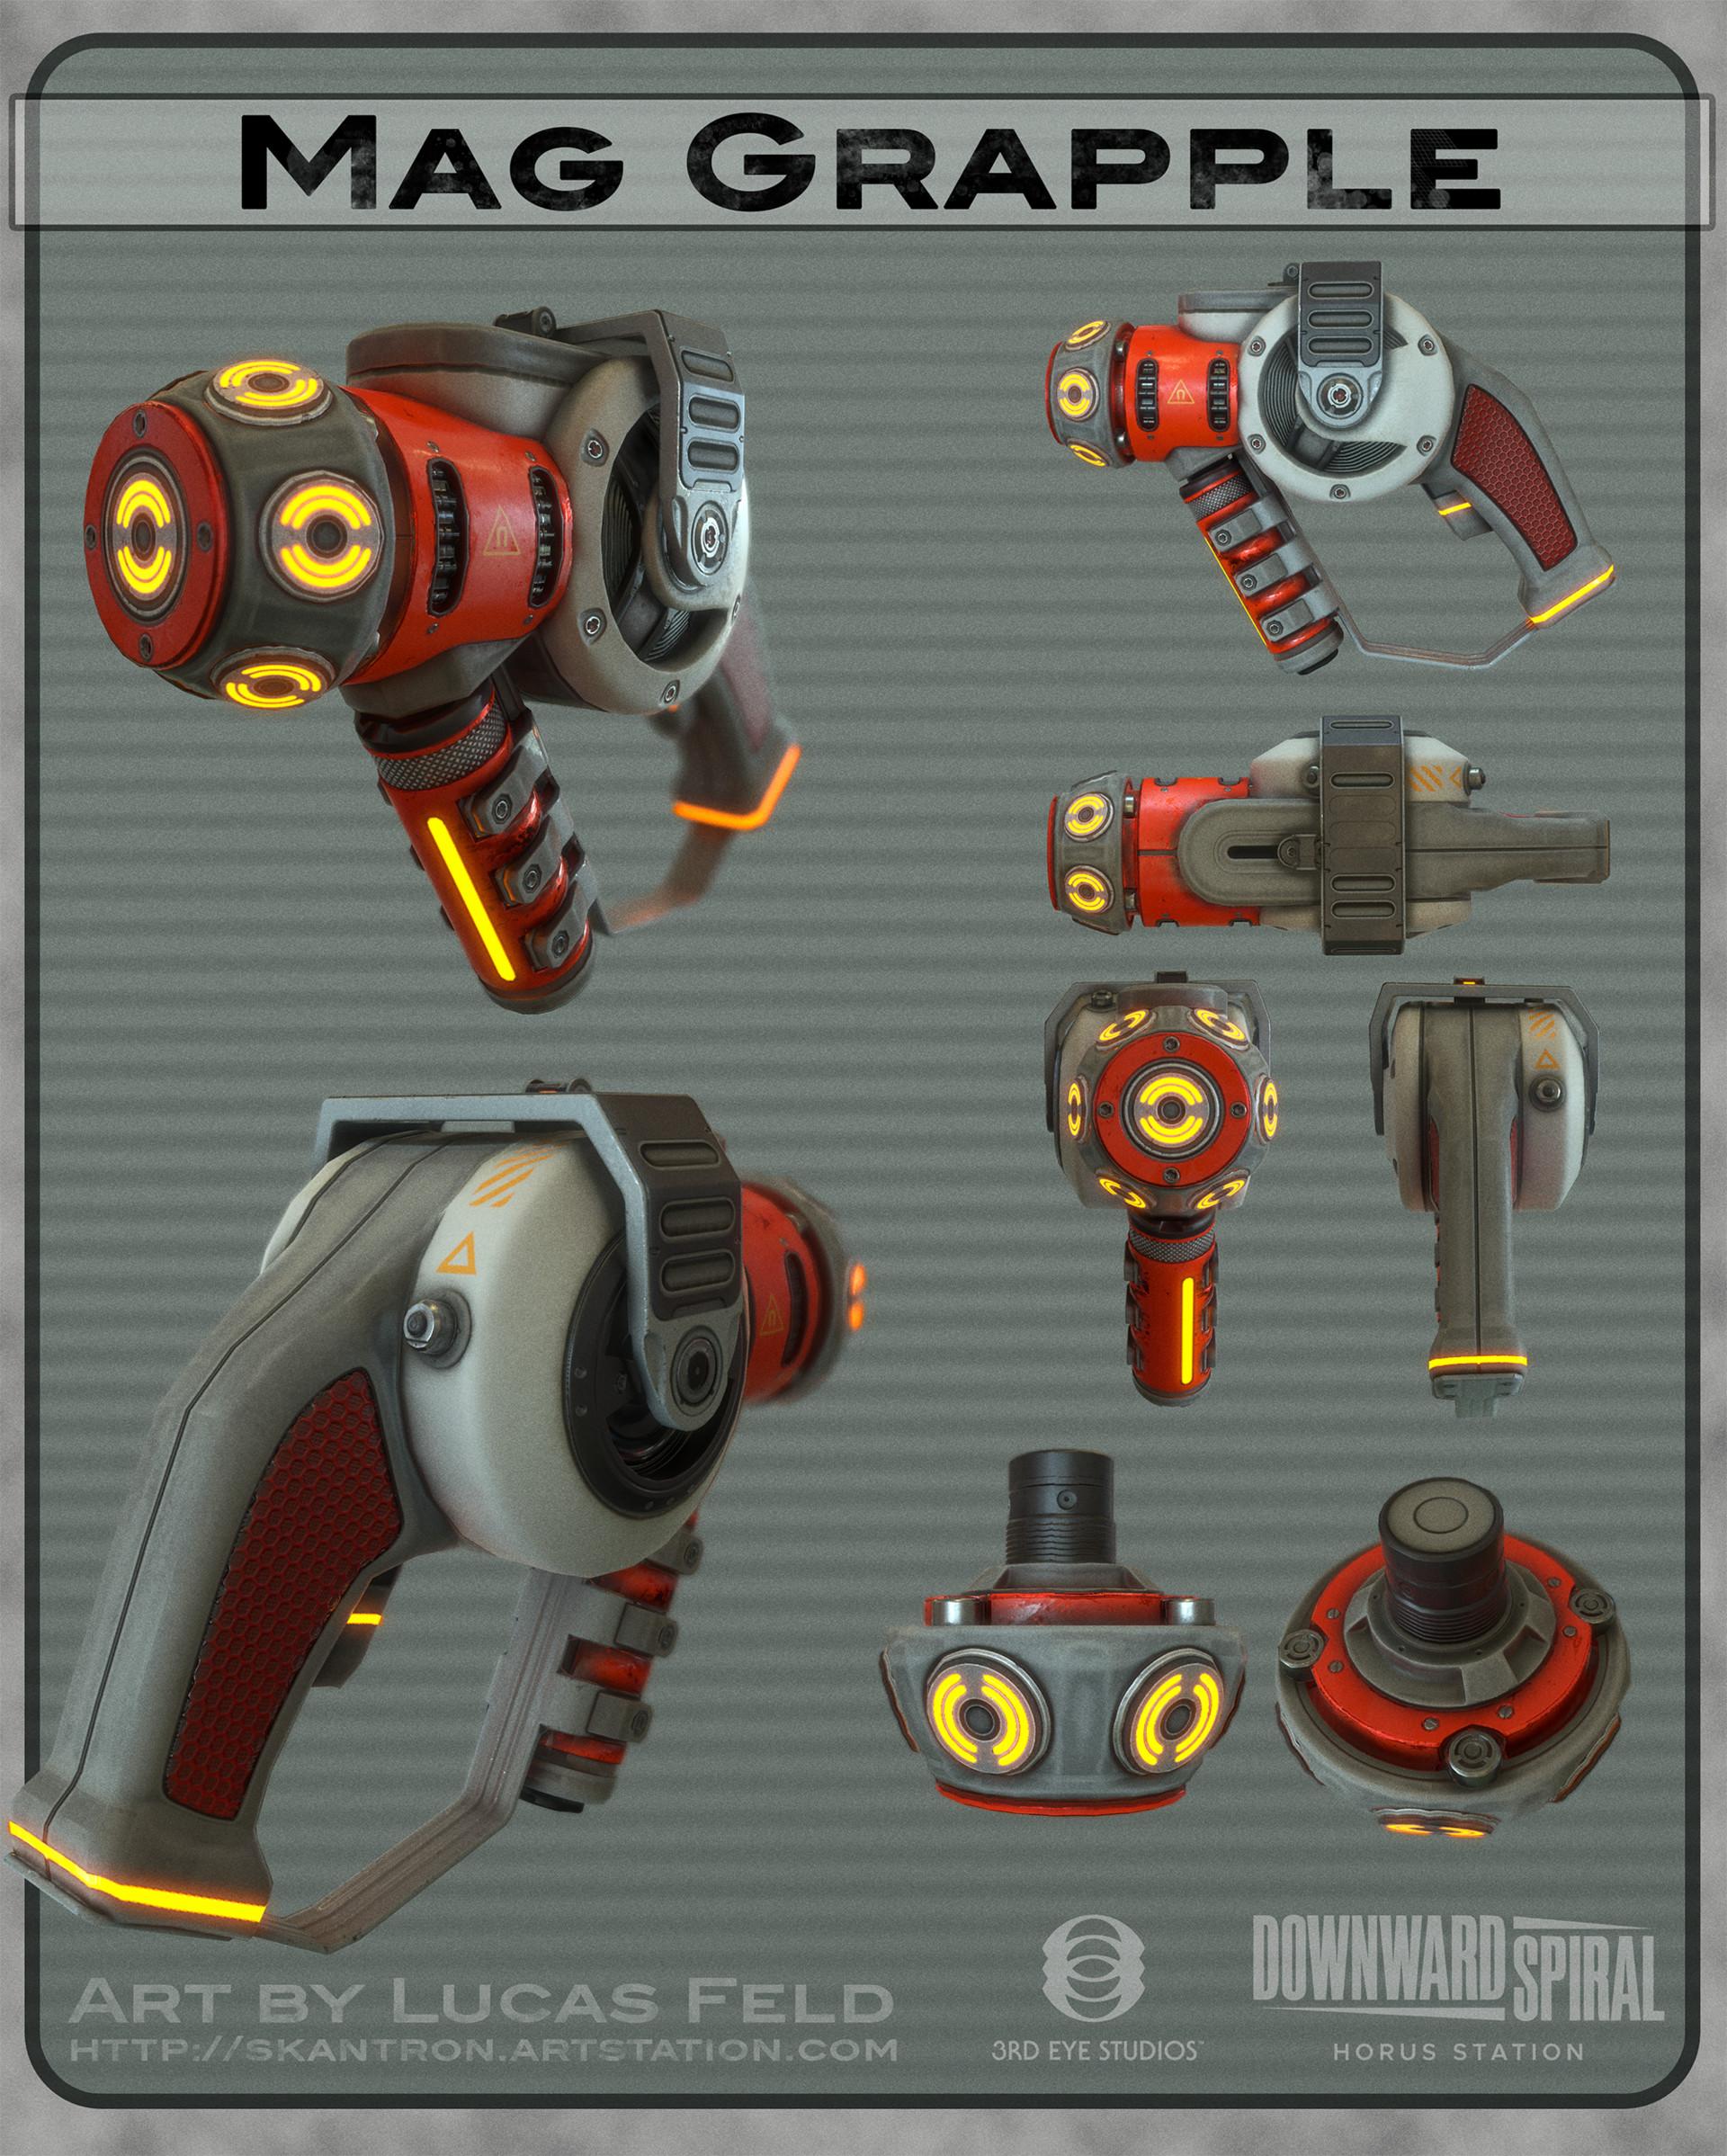 ArtStation - Downward Spiral Weapons, Lucas Feld